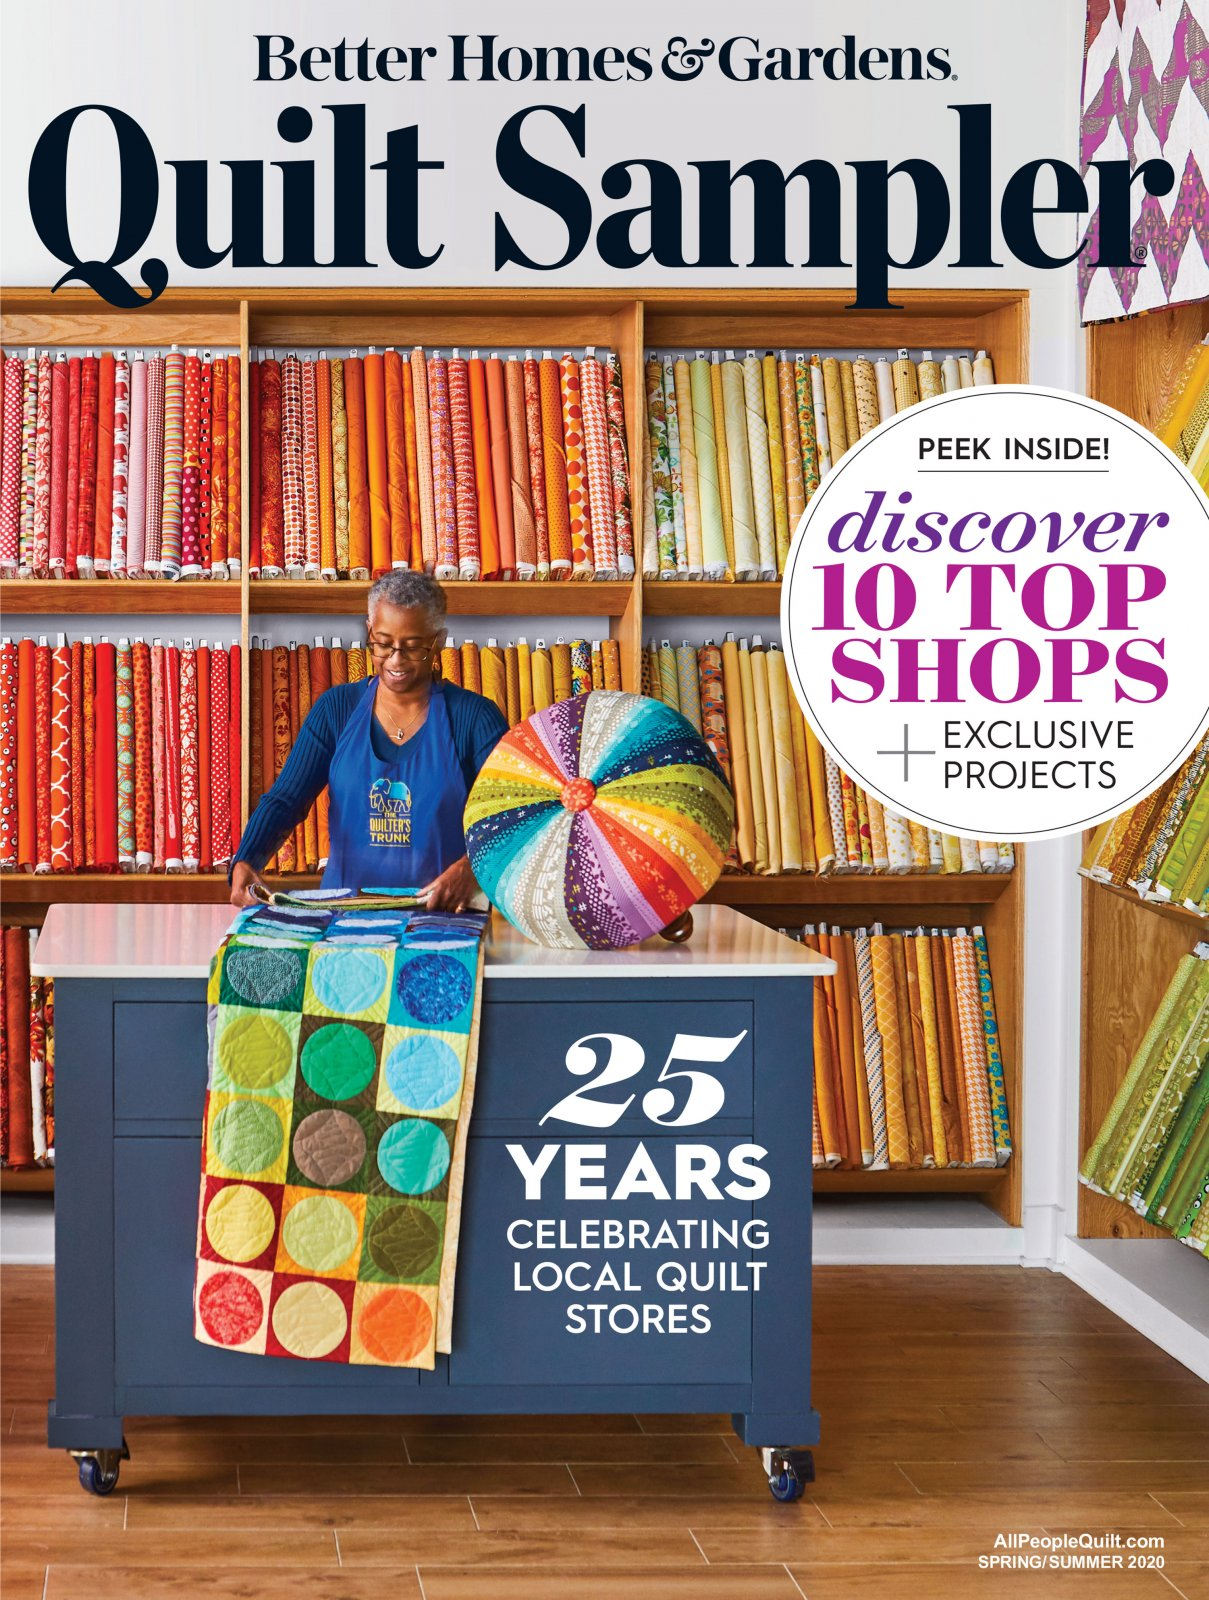 Quilt Sampler Spring/Summer 2020<br>Featured Shop - Lickety Stitch Quilts